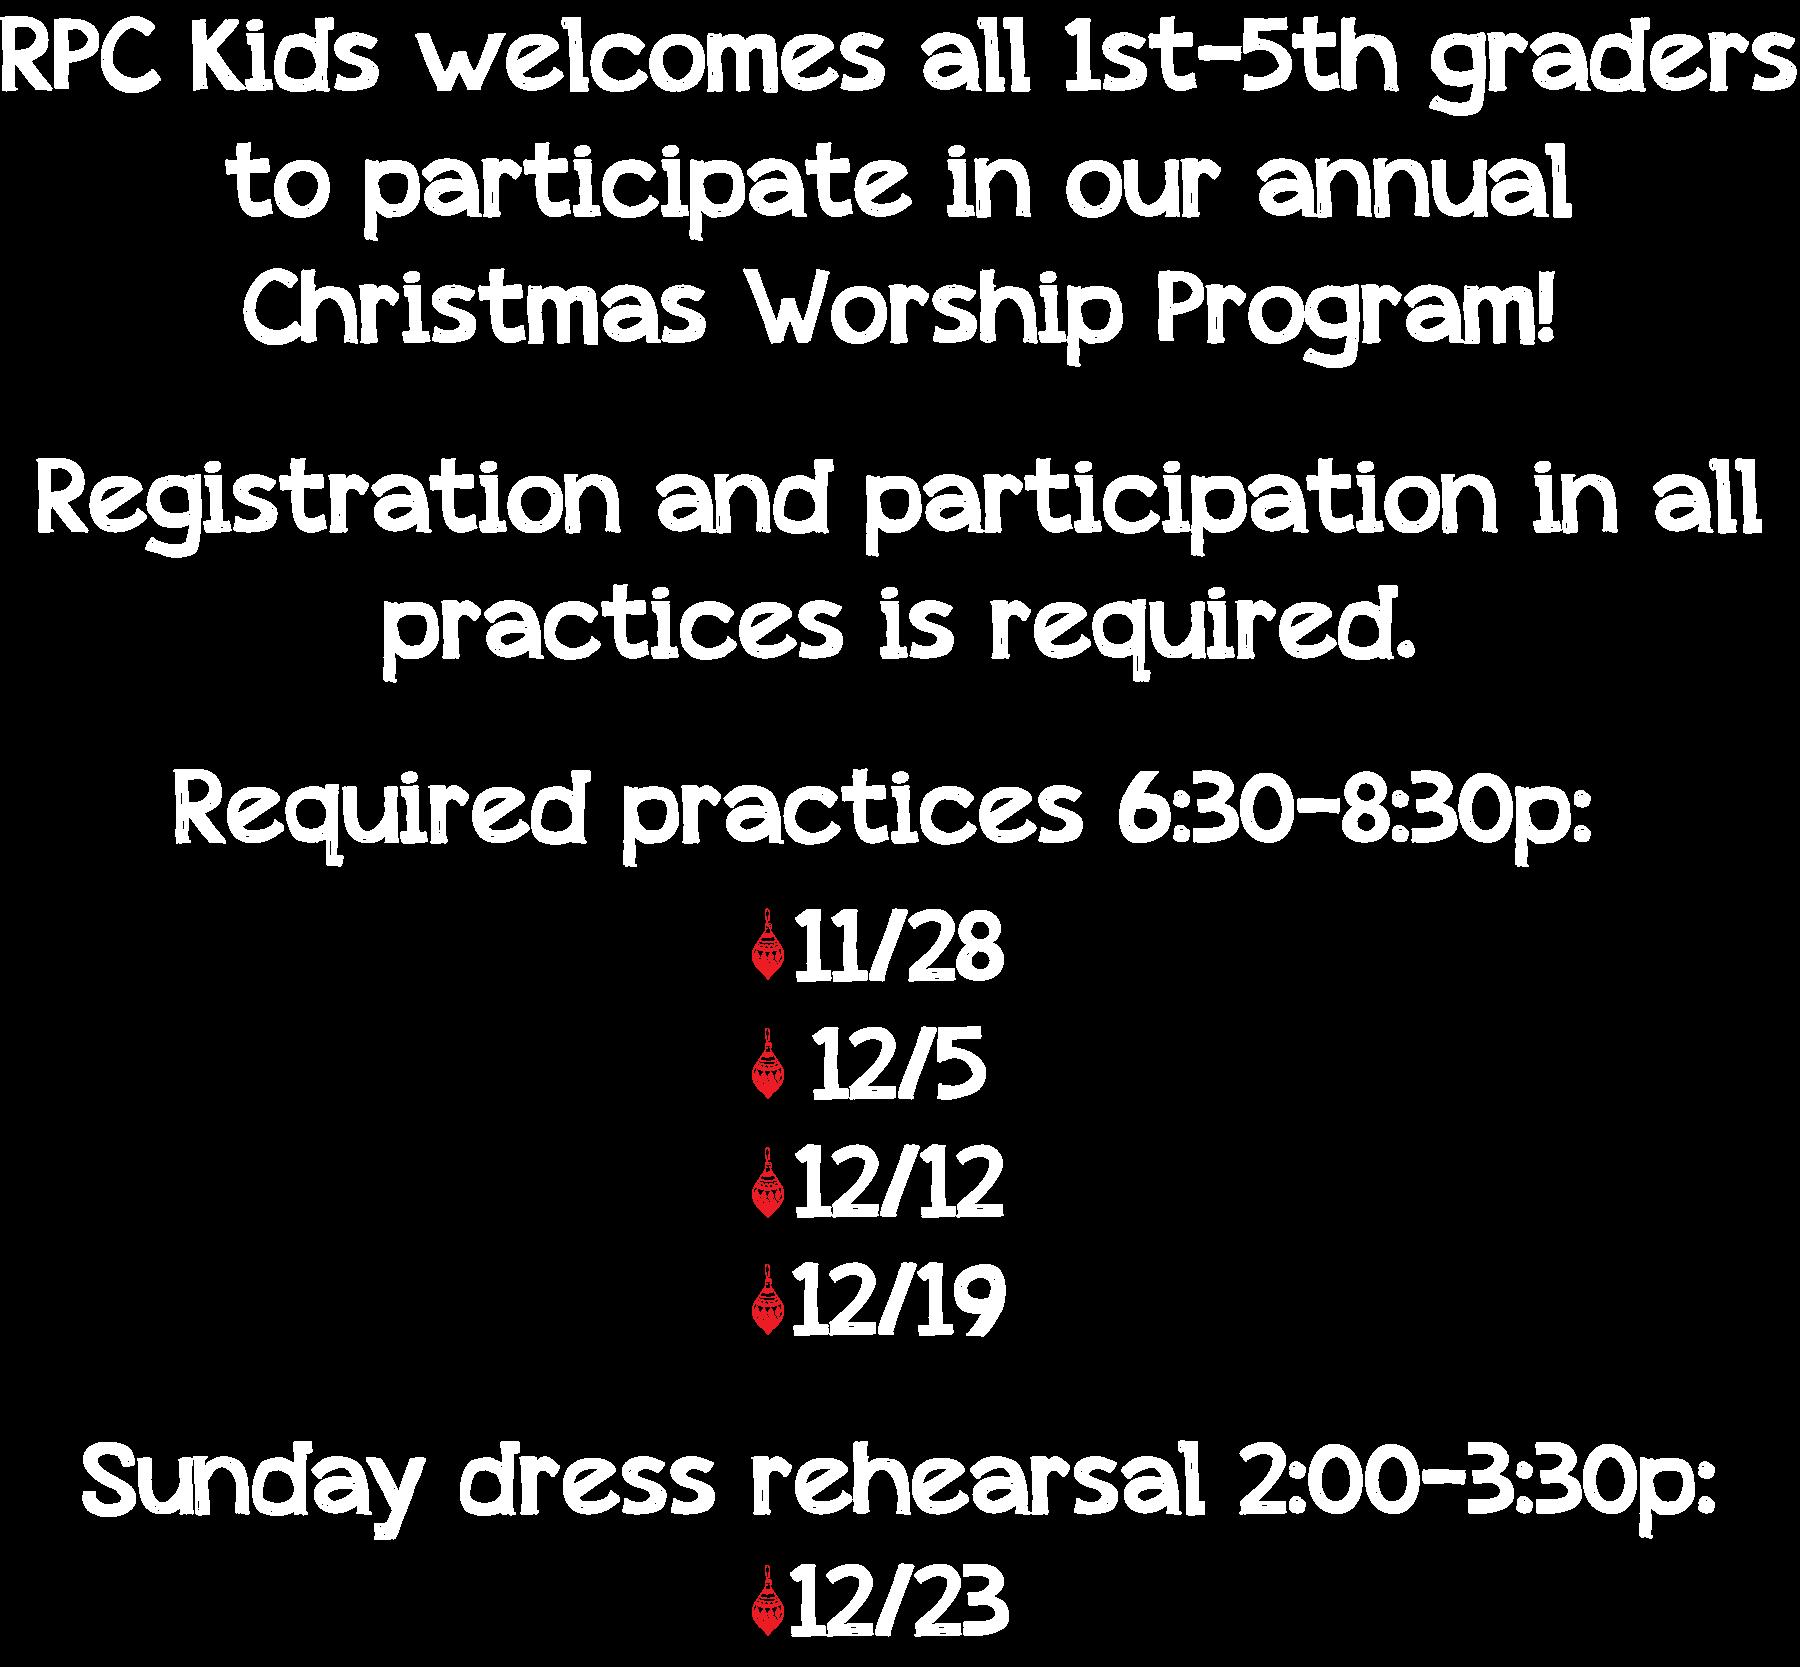 RPC-Kids-Christams-Text